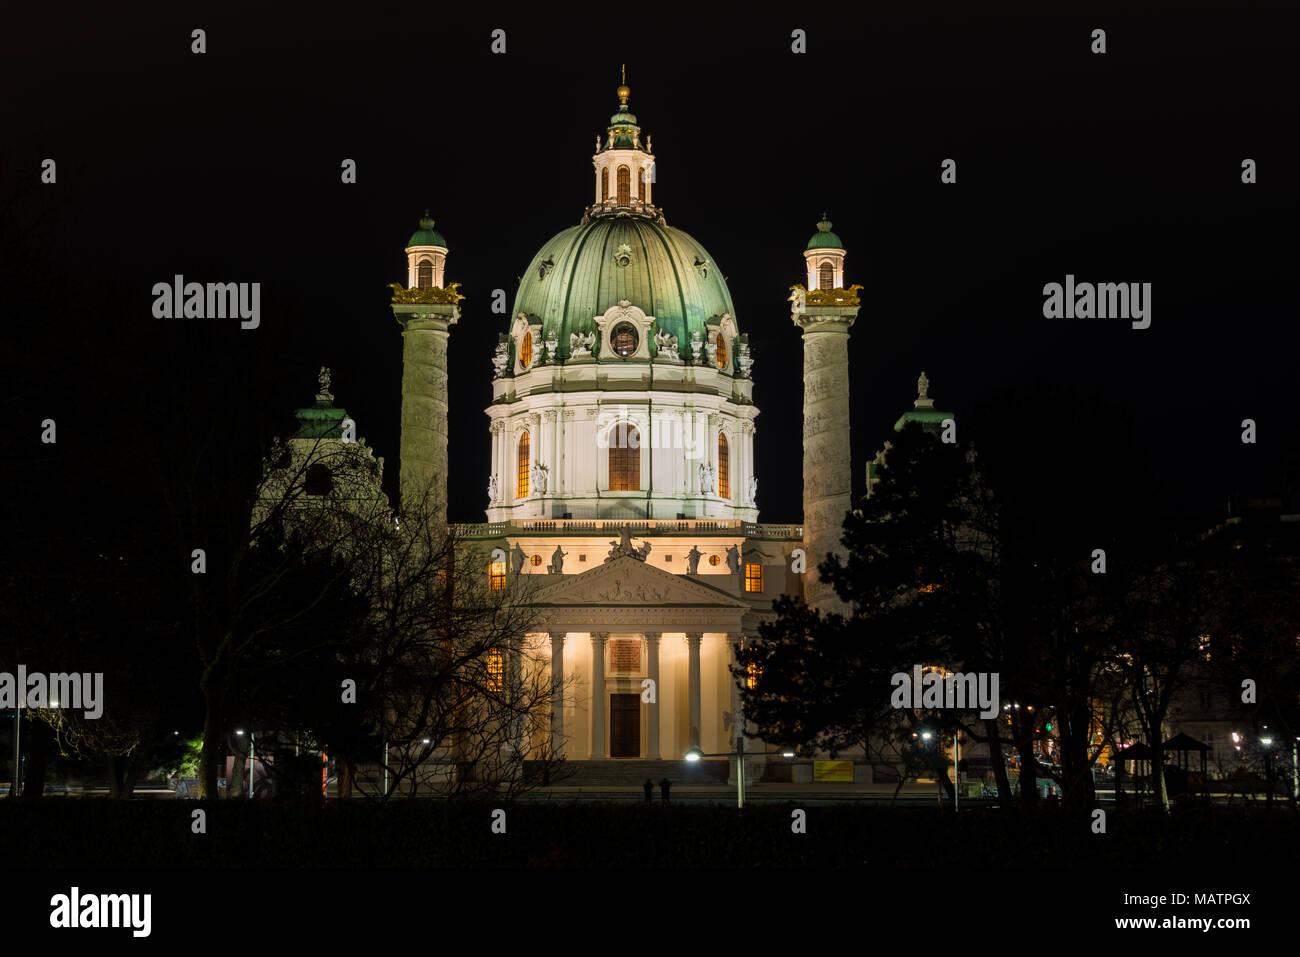 Karlskirche Wien bei Nacht - Stock Image